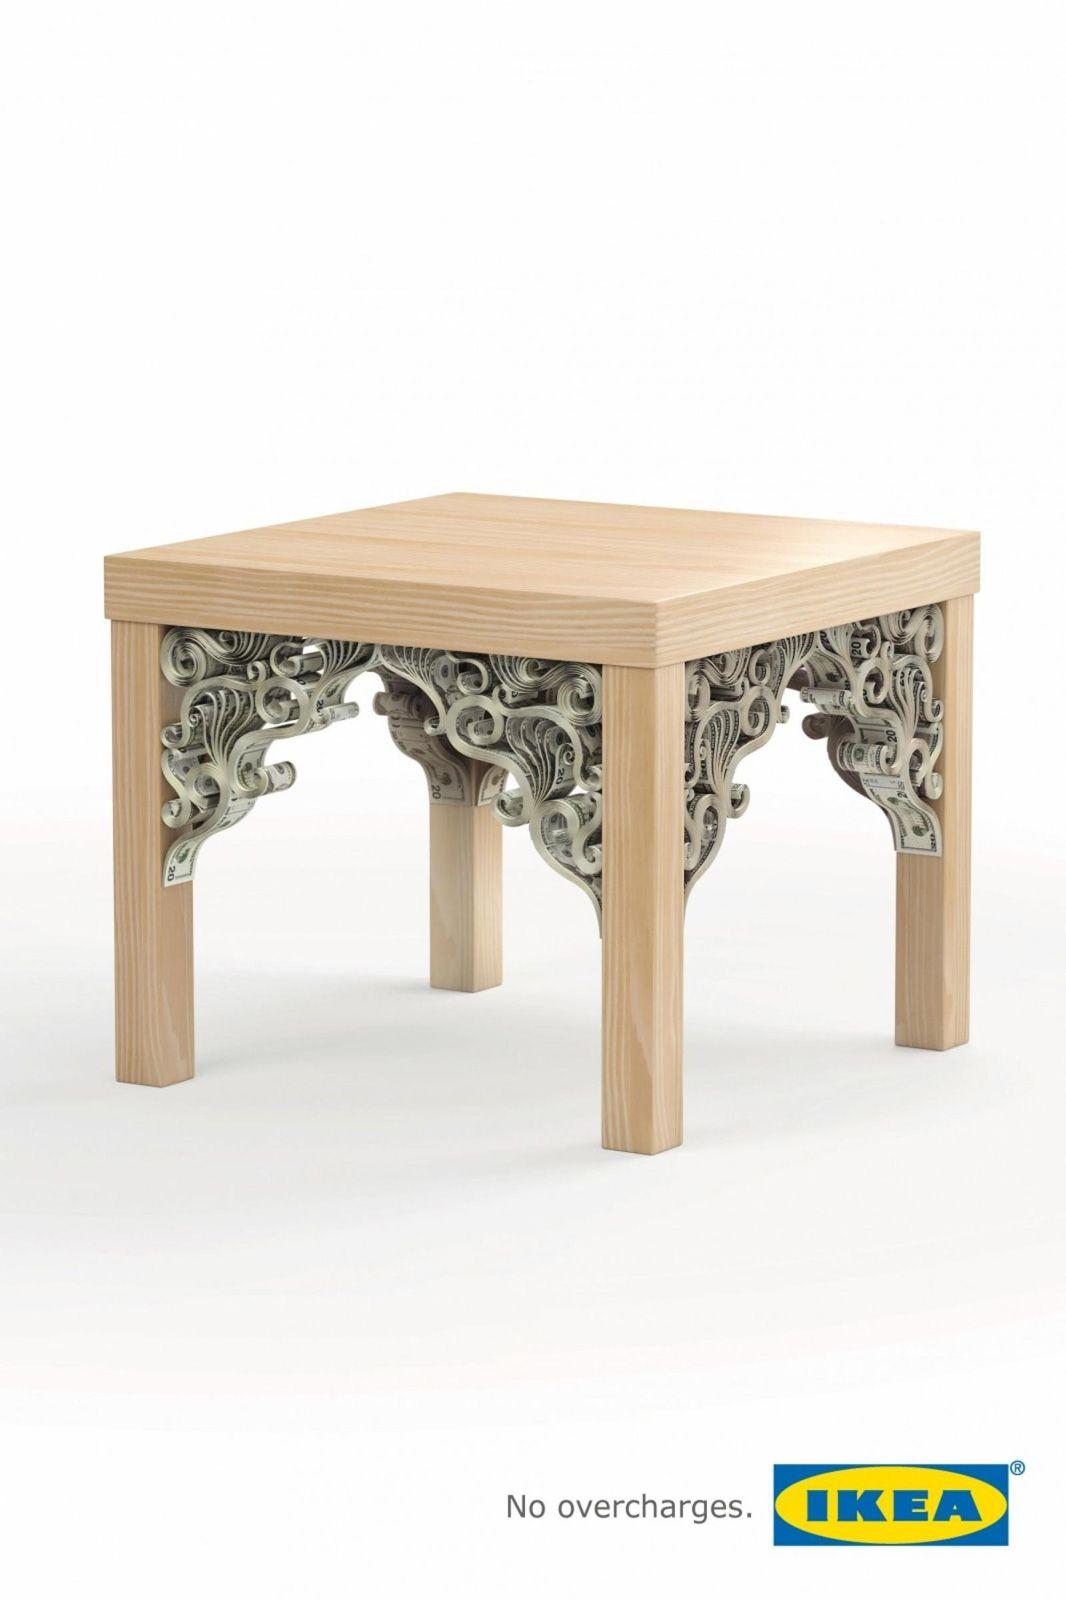 Ikea Coffee Table Ikea Coffee Table Coffee Table Ikea [ 1600 x 1066 Pixel ]